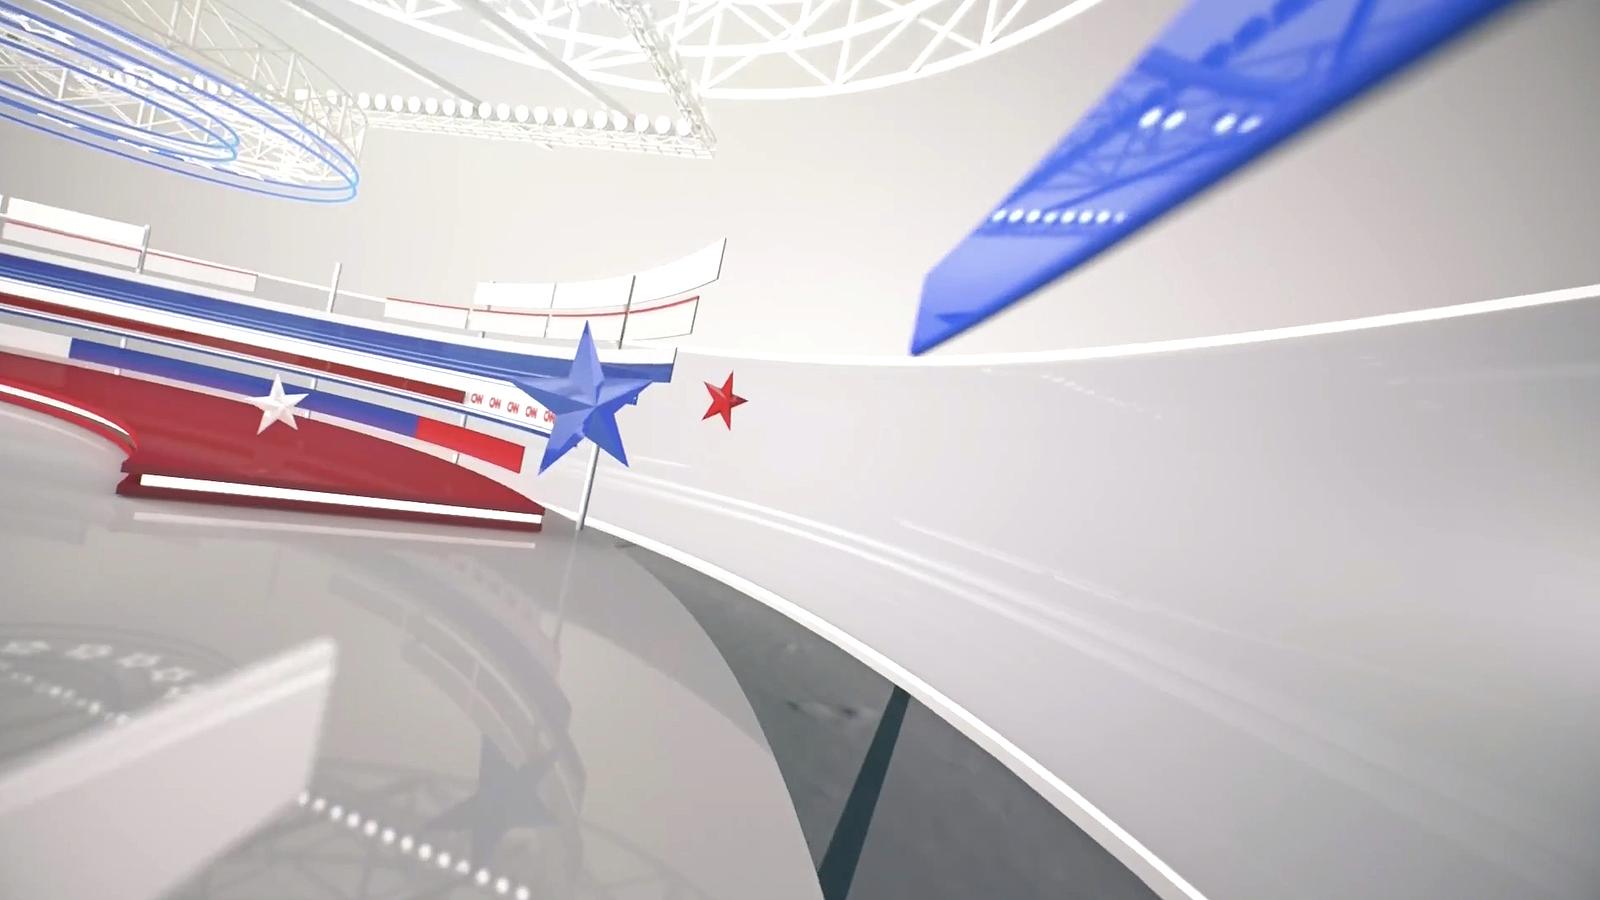 NCS_CNN-Dem-Debate-Cold-Open_Graphics_0015